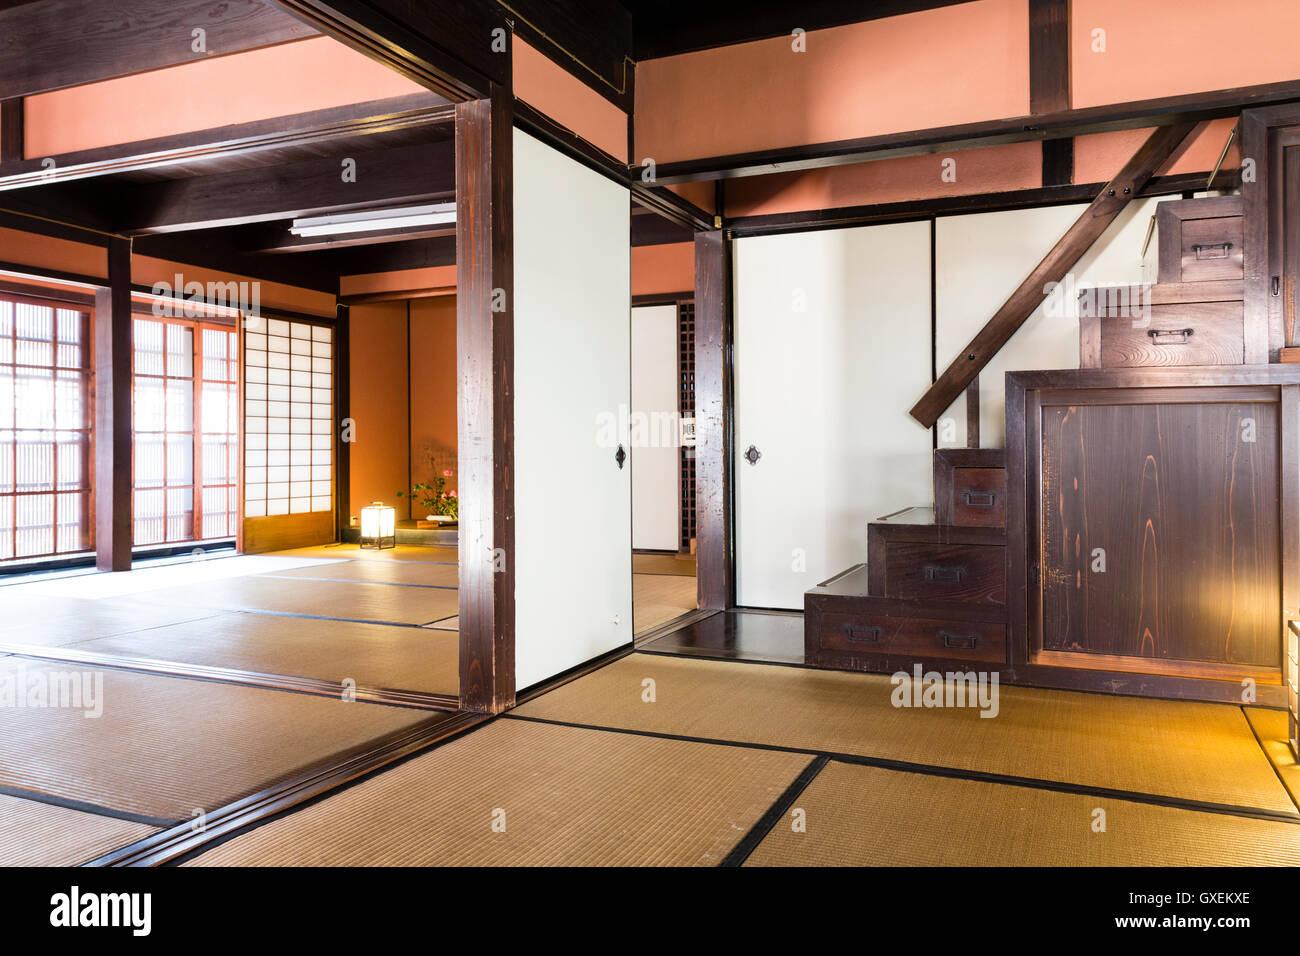 Japan, Izushi. Izushi Shiryokan Museum, innen. 2 große Tatami Matte ...